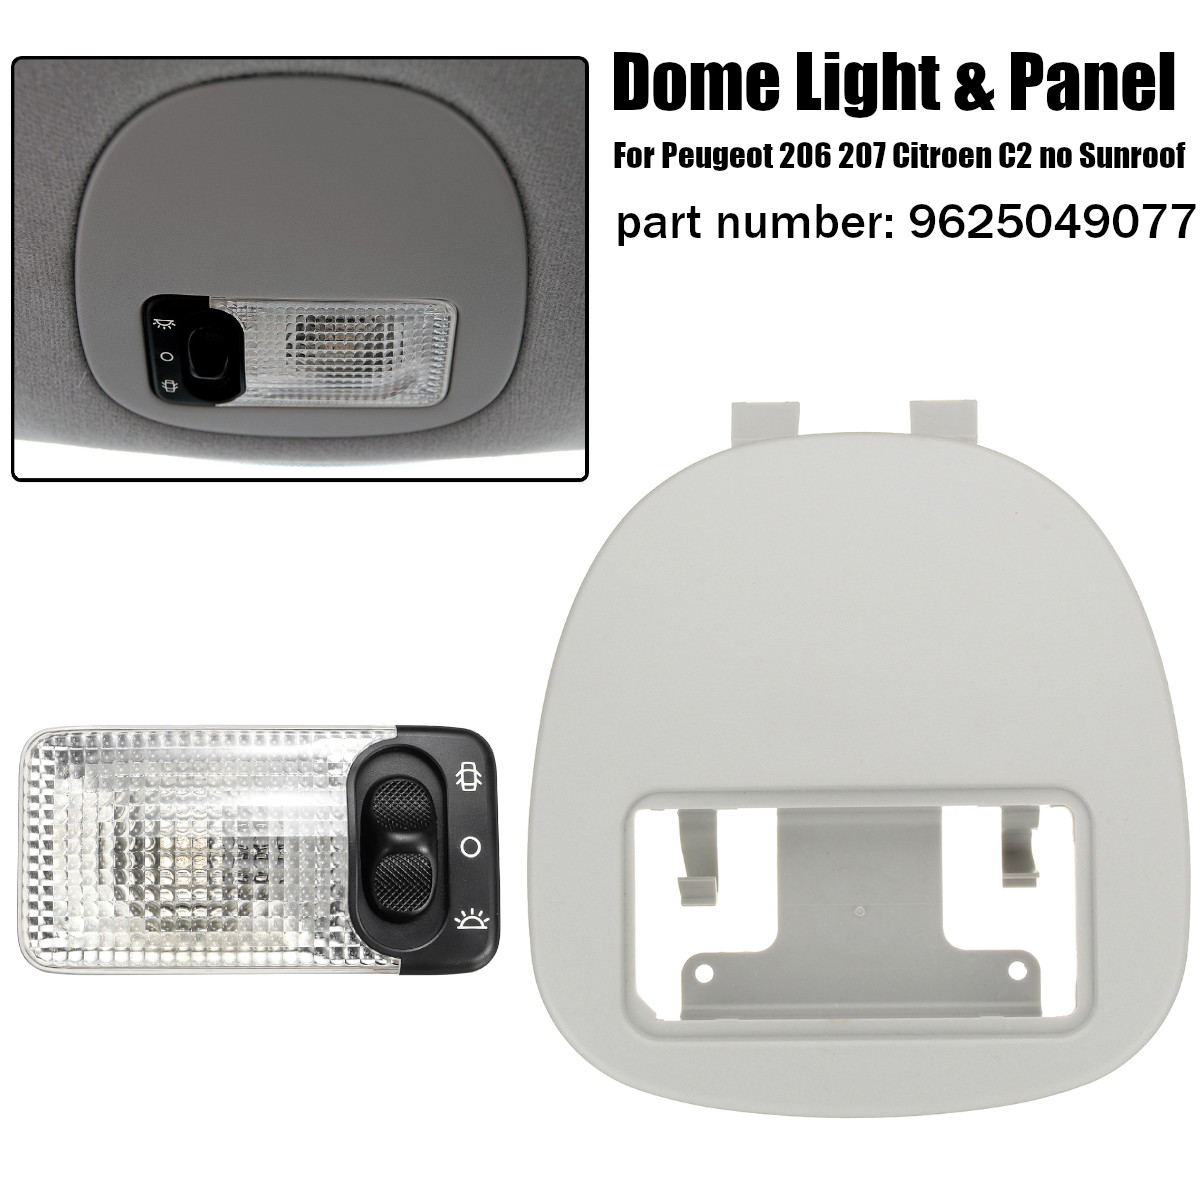 1 Set Frente Car Interior Dome Light Reading Lamp & Light Painel Escudo Capa Para Peugeot 206 207 Citroen c2 9625049077